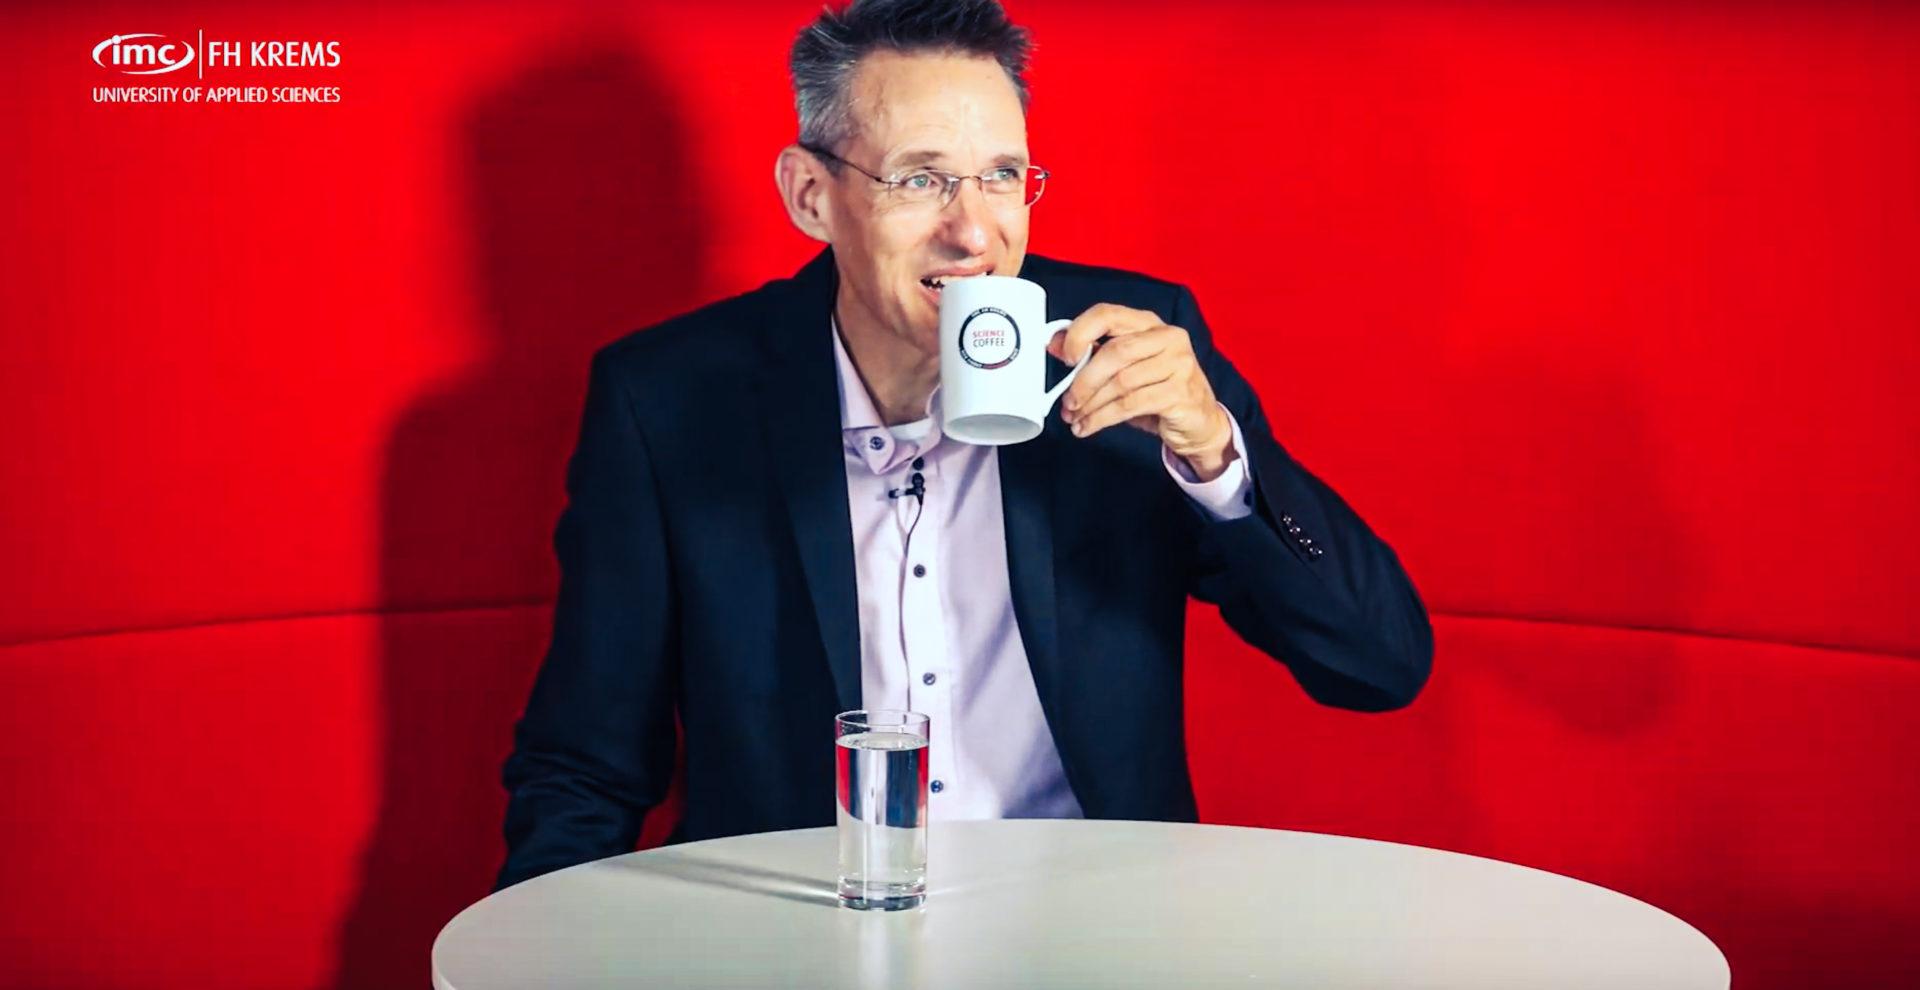 IMC Forscher Michi Bartz